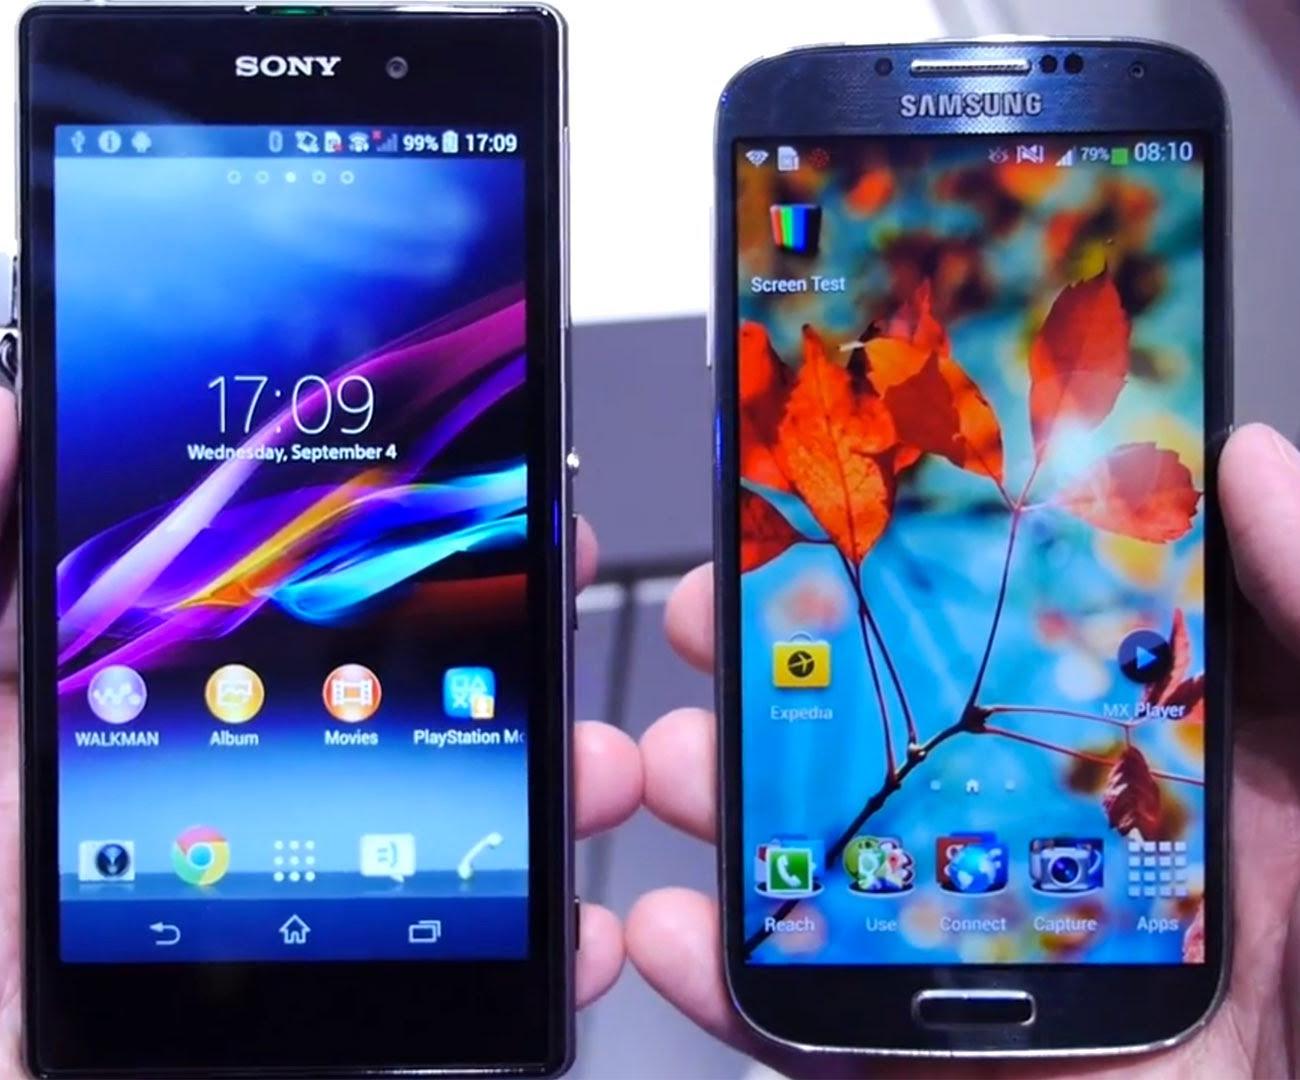 Рис. 5. Сравнение с Samsung Galaxy S4